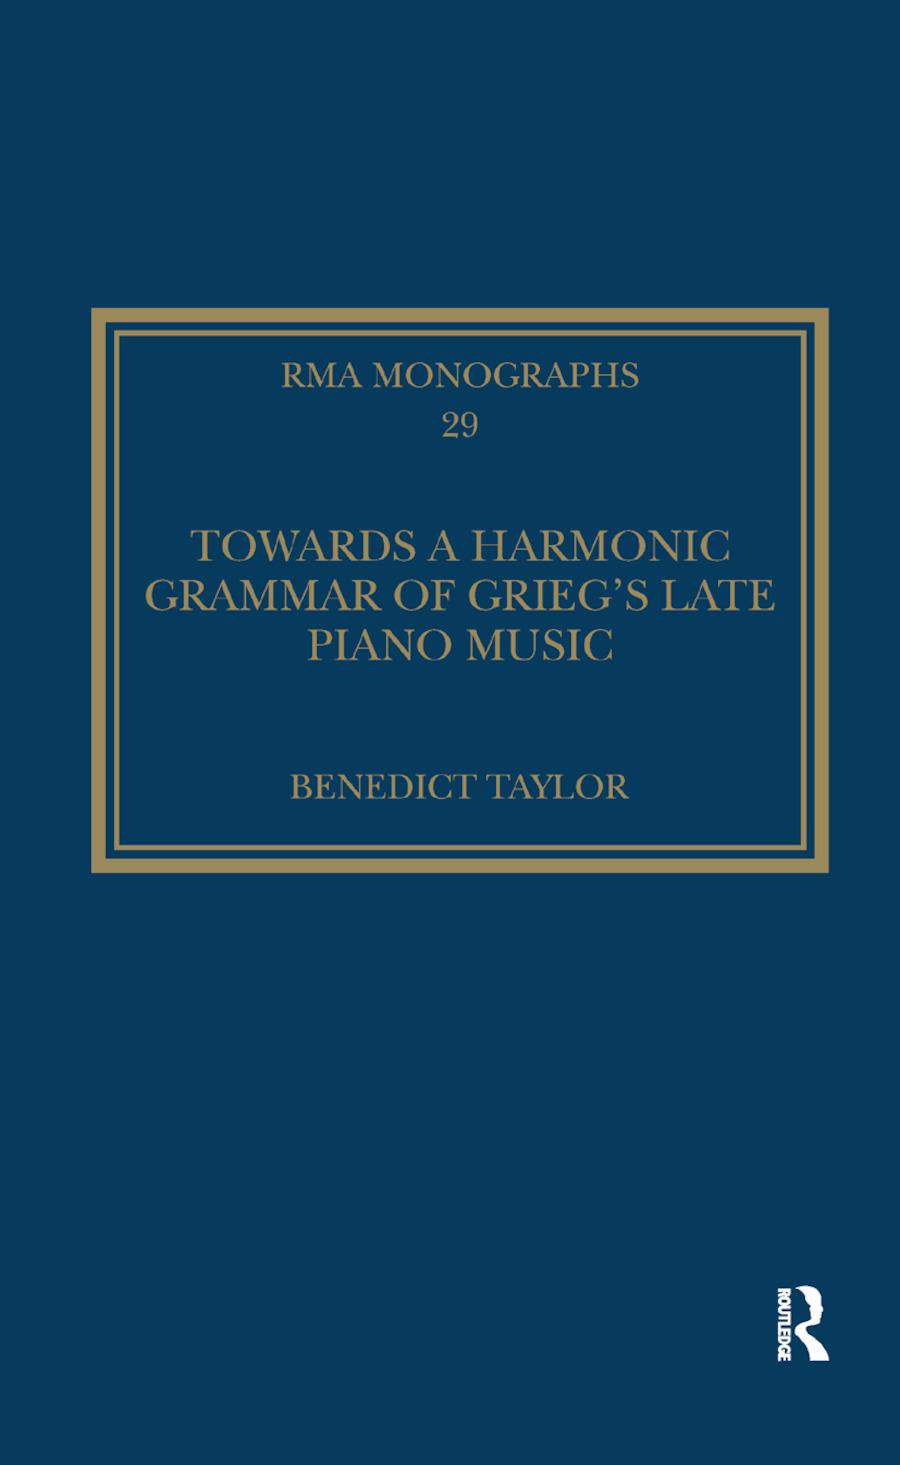 Towards a Harmonic Grammar of Grieg's Late Piano Music